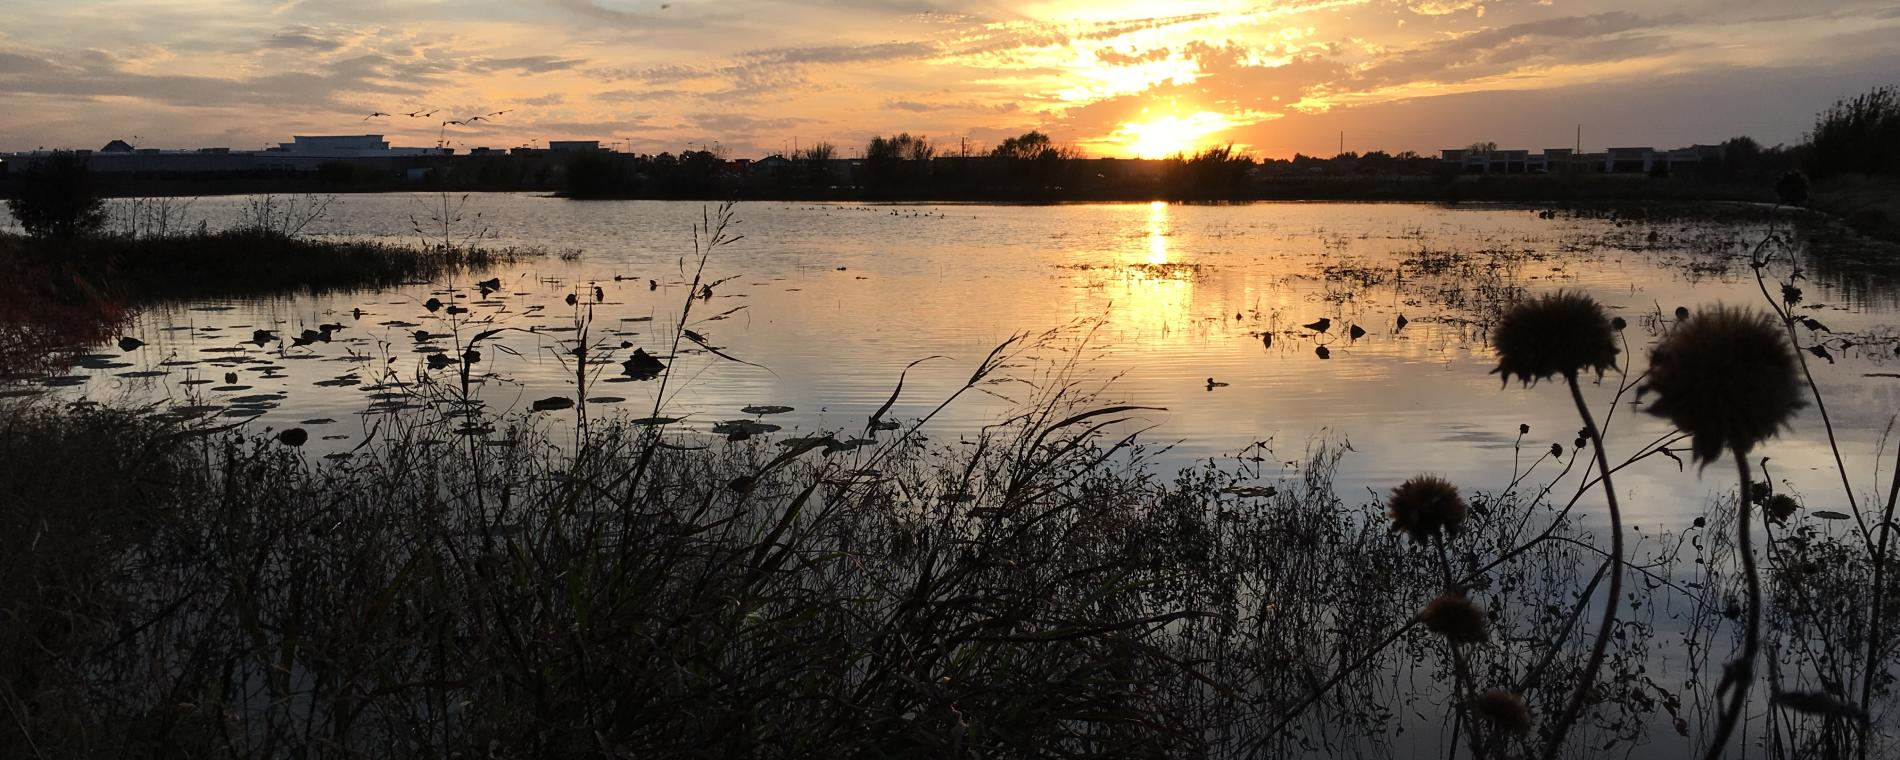 Pracht Wetlands Night